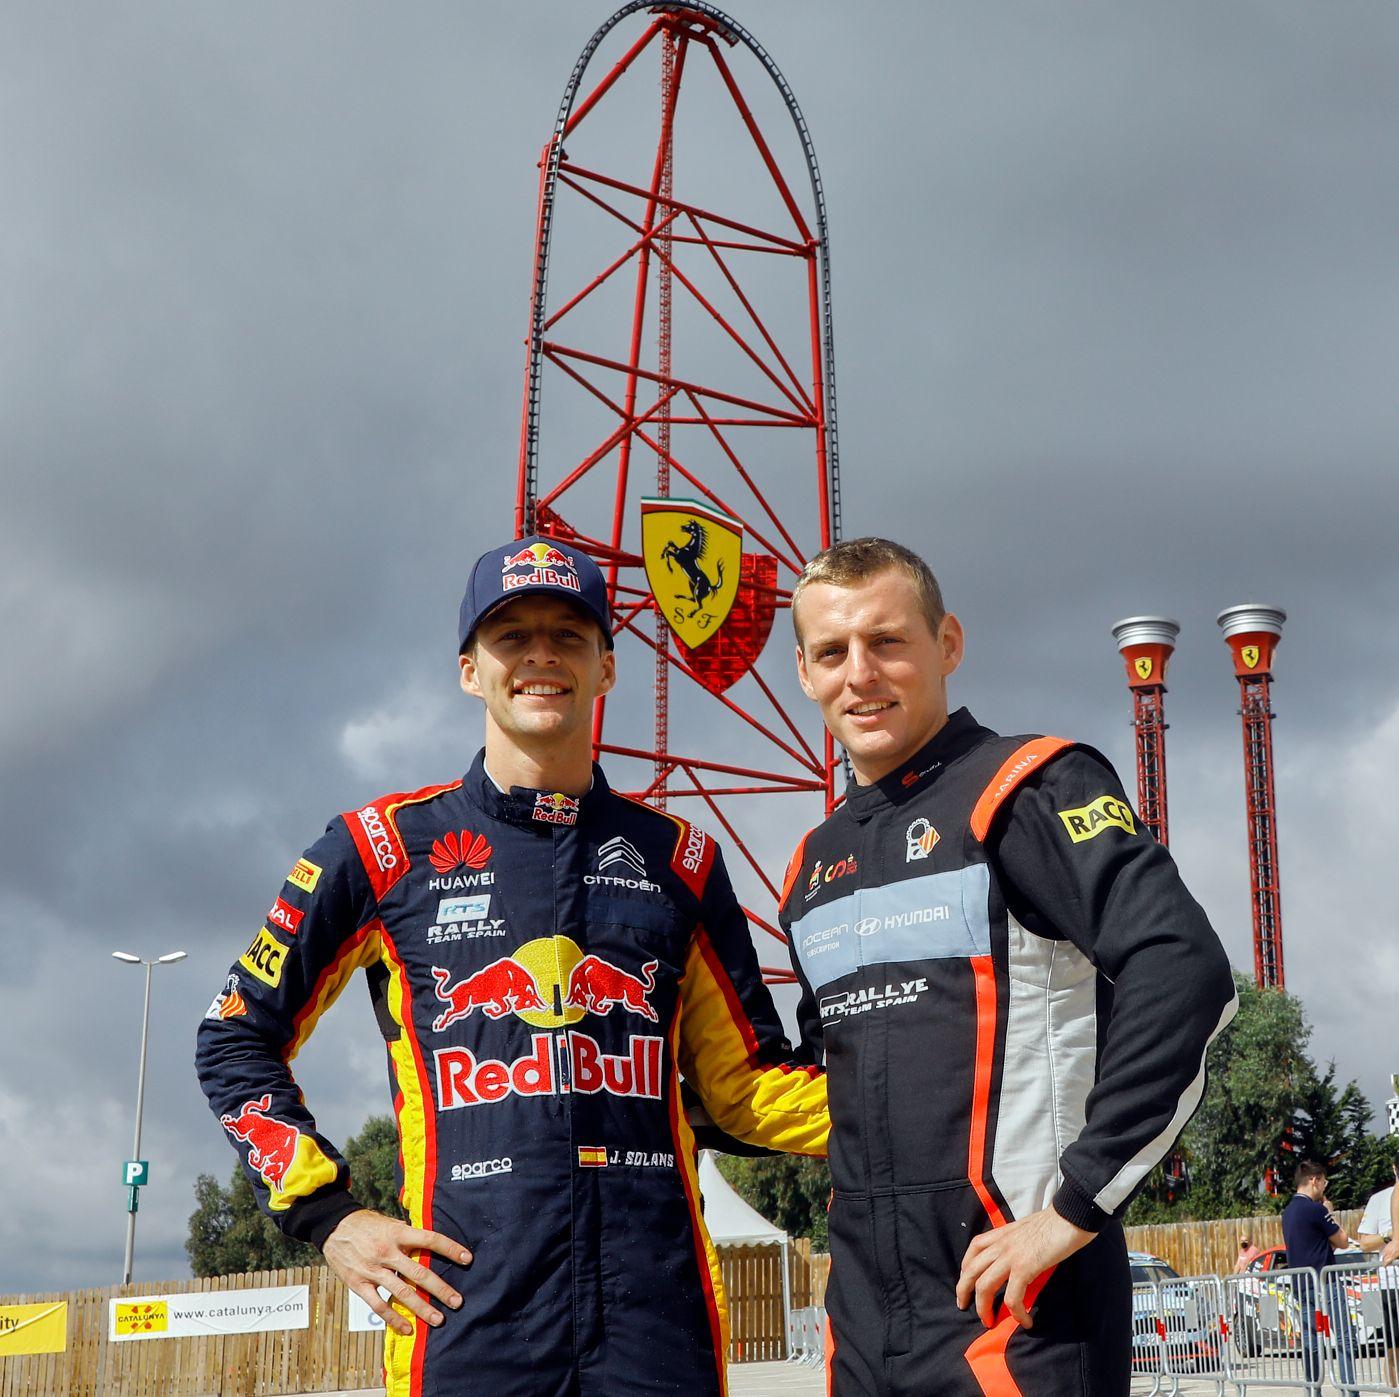 WRC: 56º RallyRACC Catalunya Costa Daurada - Rally de España [14-17 Octubre] - Página 3 FBqzXChUUAkF6ST?format=jpg&name=large